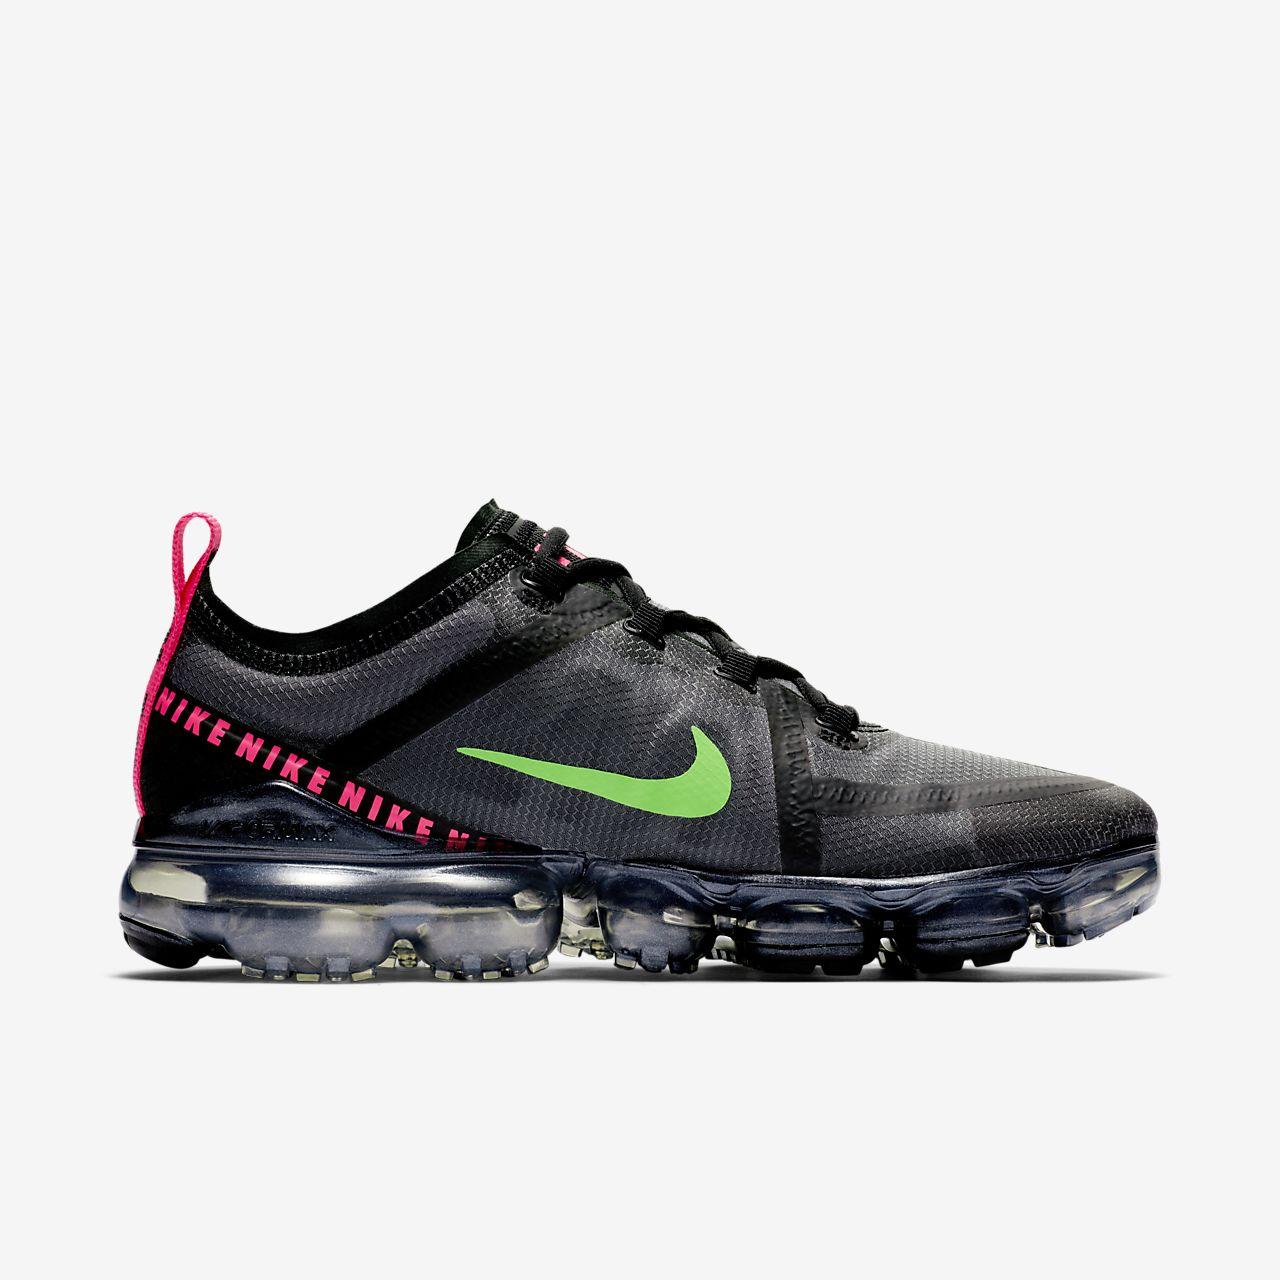 Officiel Nike Air Max 270 Chaussure Nike Running Prix Pour Homme Light Bone Hot Punch AH8050 003 1804151419 Officiel Nike Sneaker Pour Homme Et